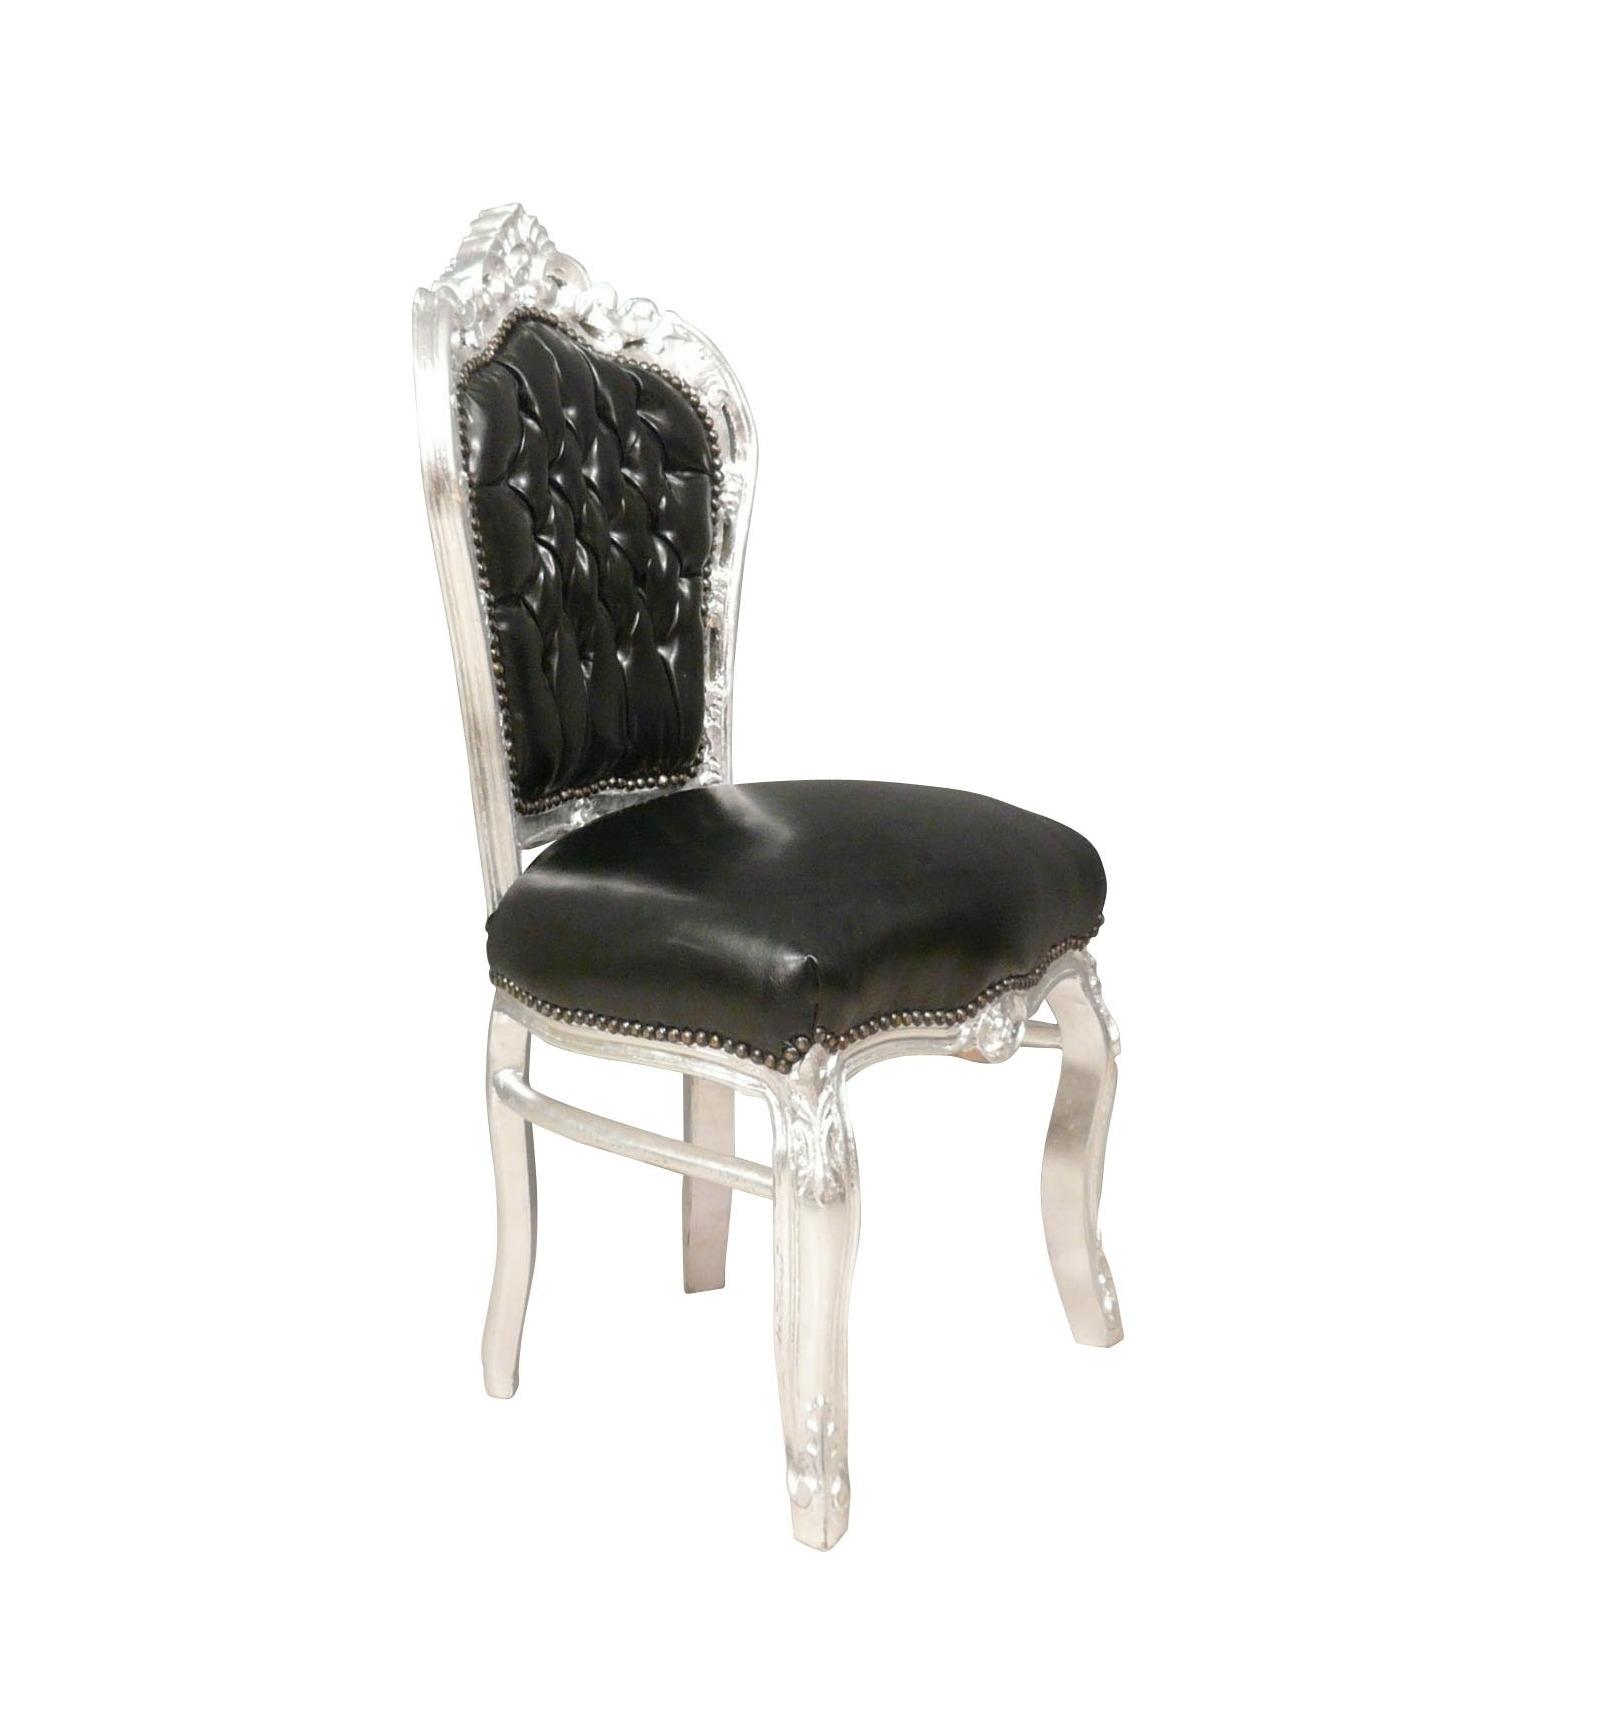 Chaise Baroque Noire Tissu Imitant Le Cuir